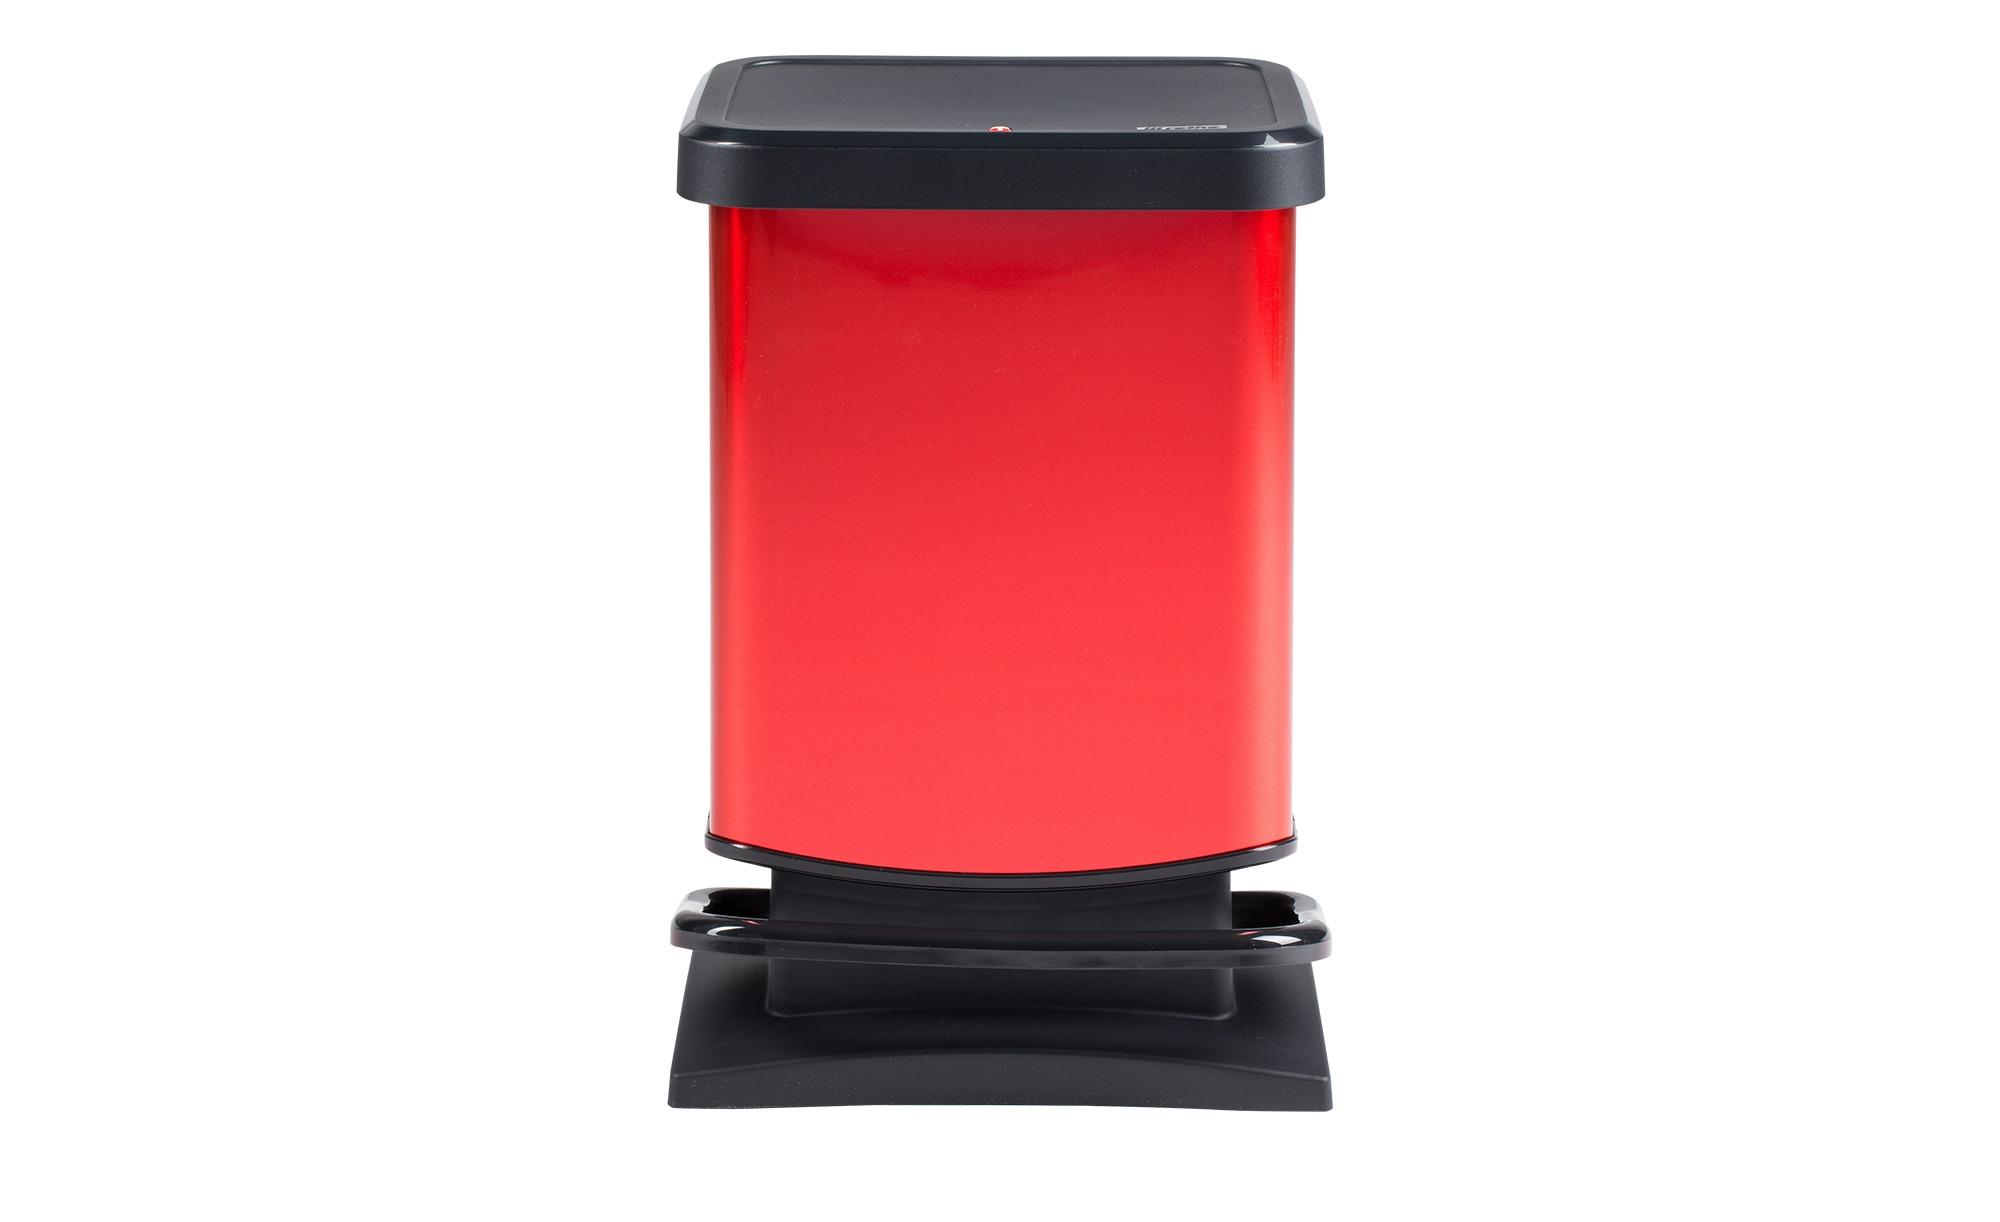 Rotho Treteimer 20 l Rot  Paso - rot - Kunststoff - Küchenzubehör & Helfer günstig online kaufen